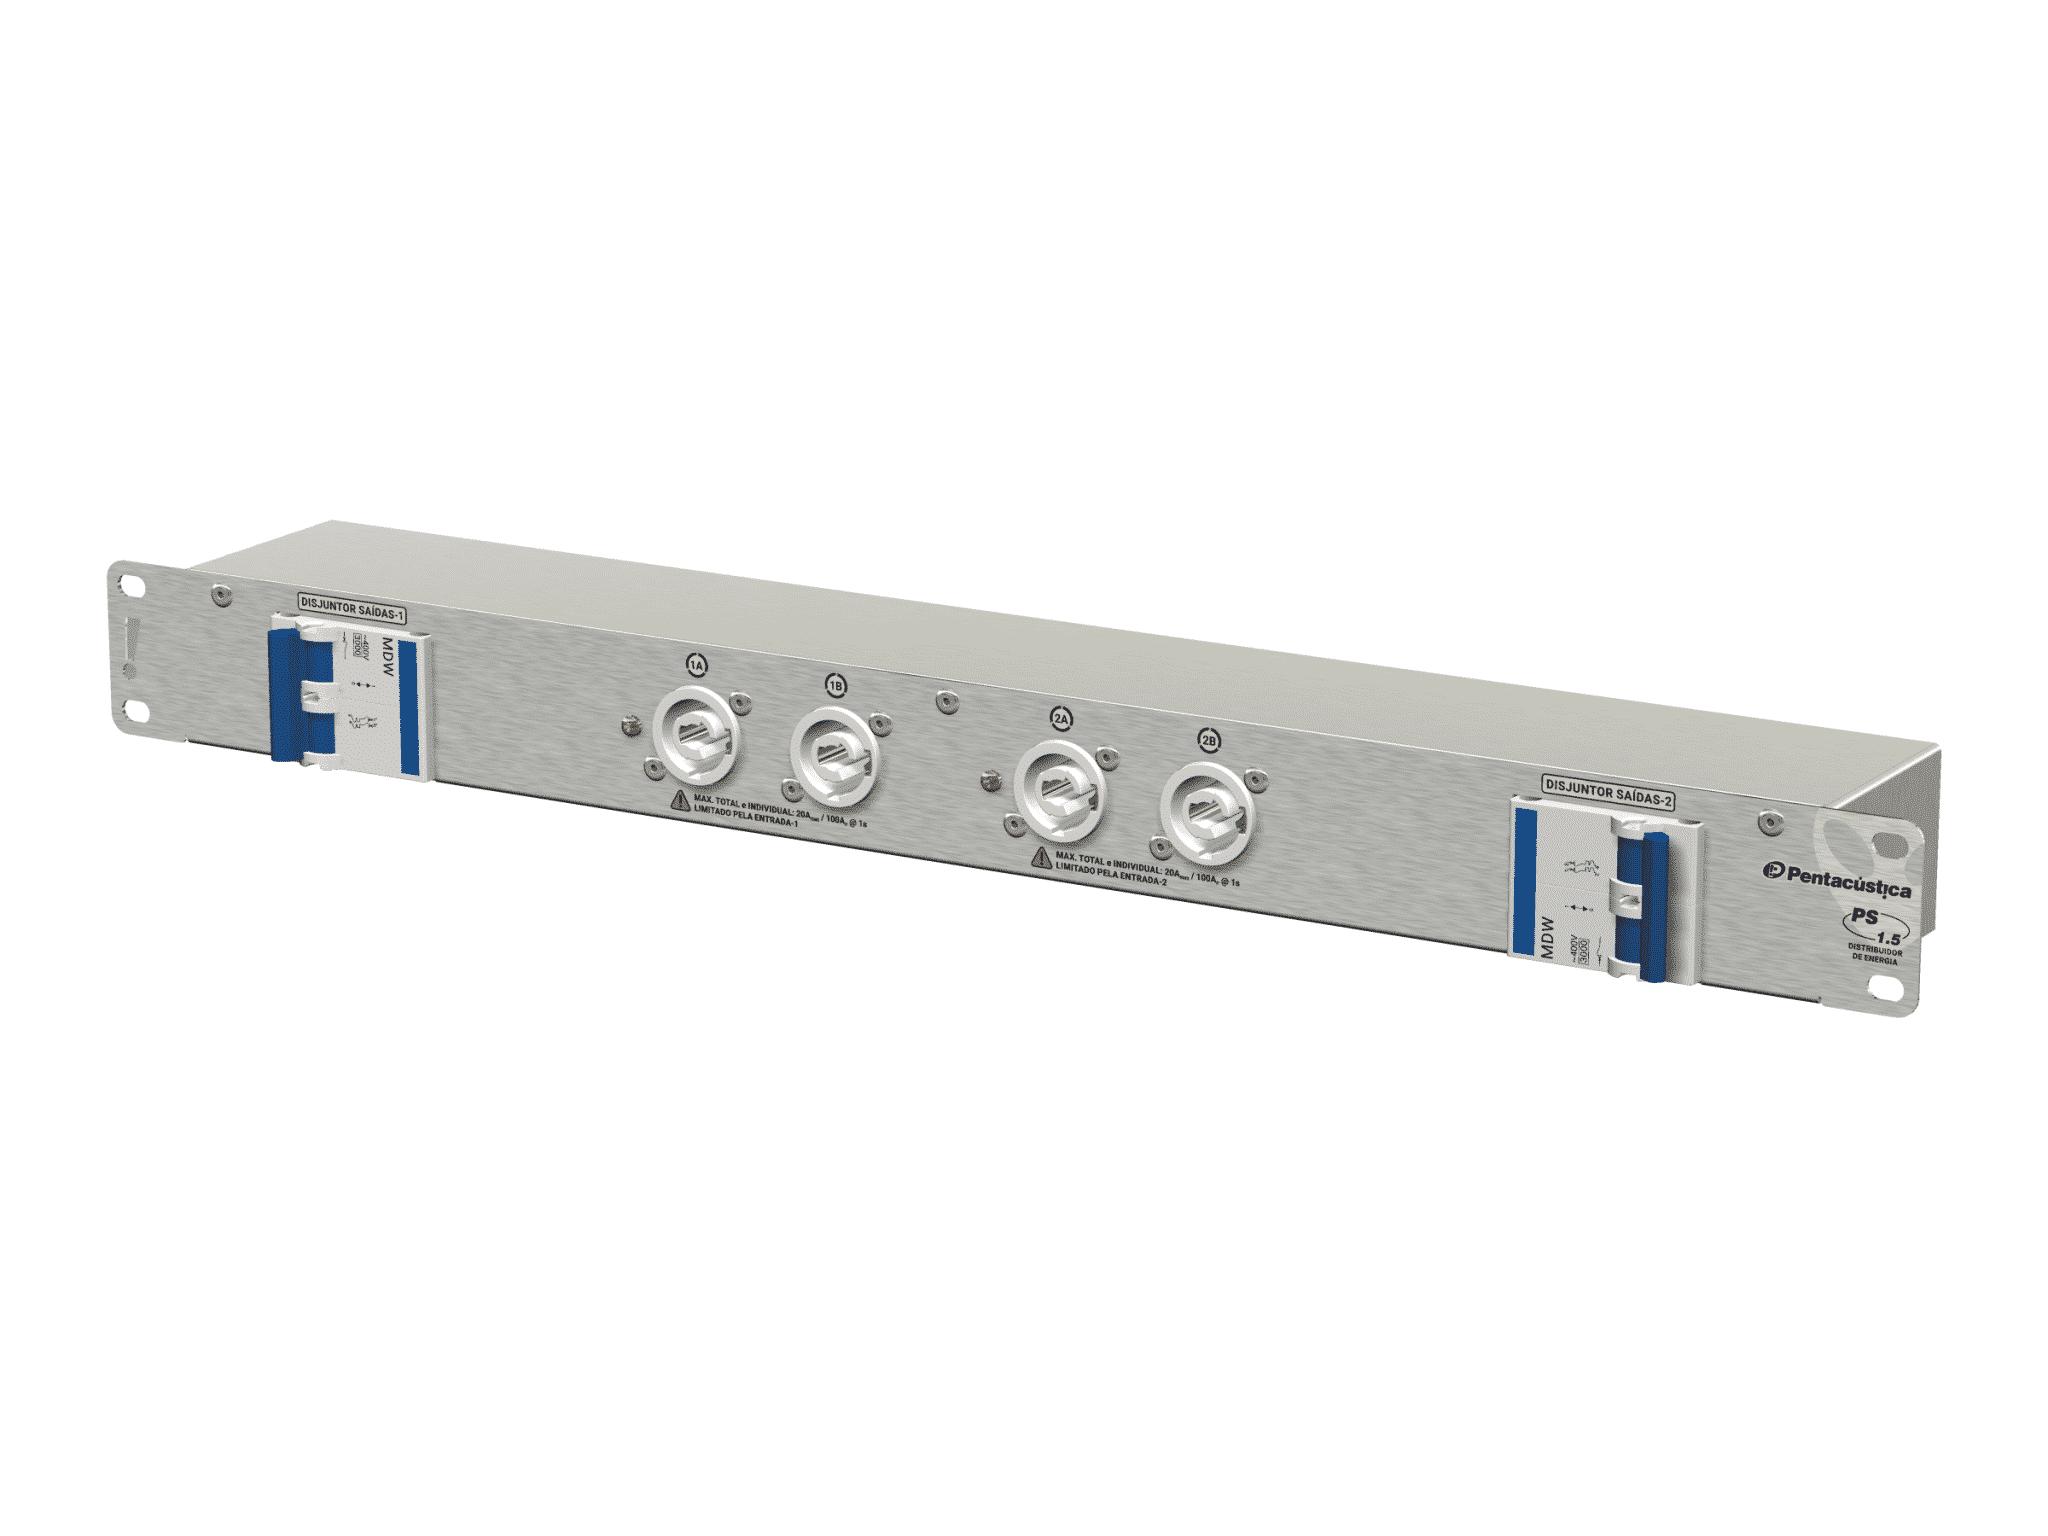 Distribuidor de energia PS-1.5 PC 20C